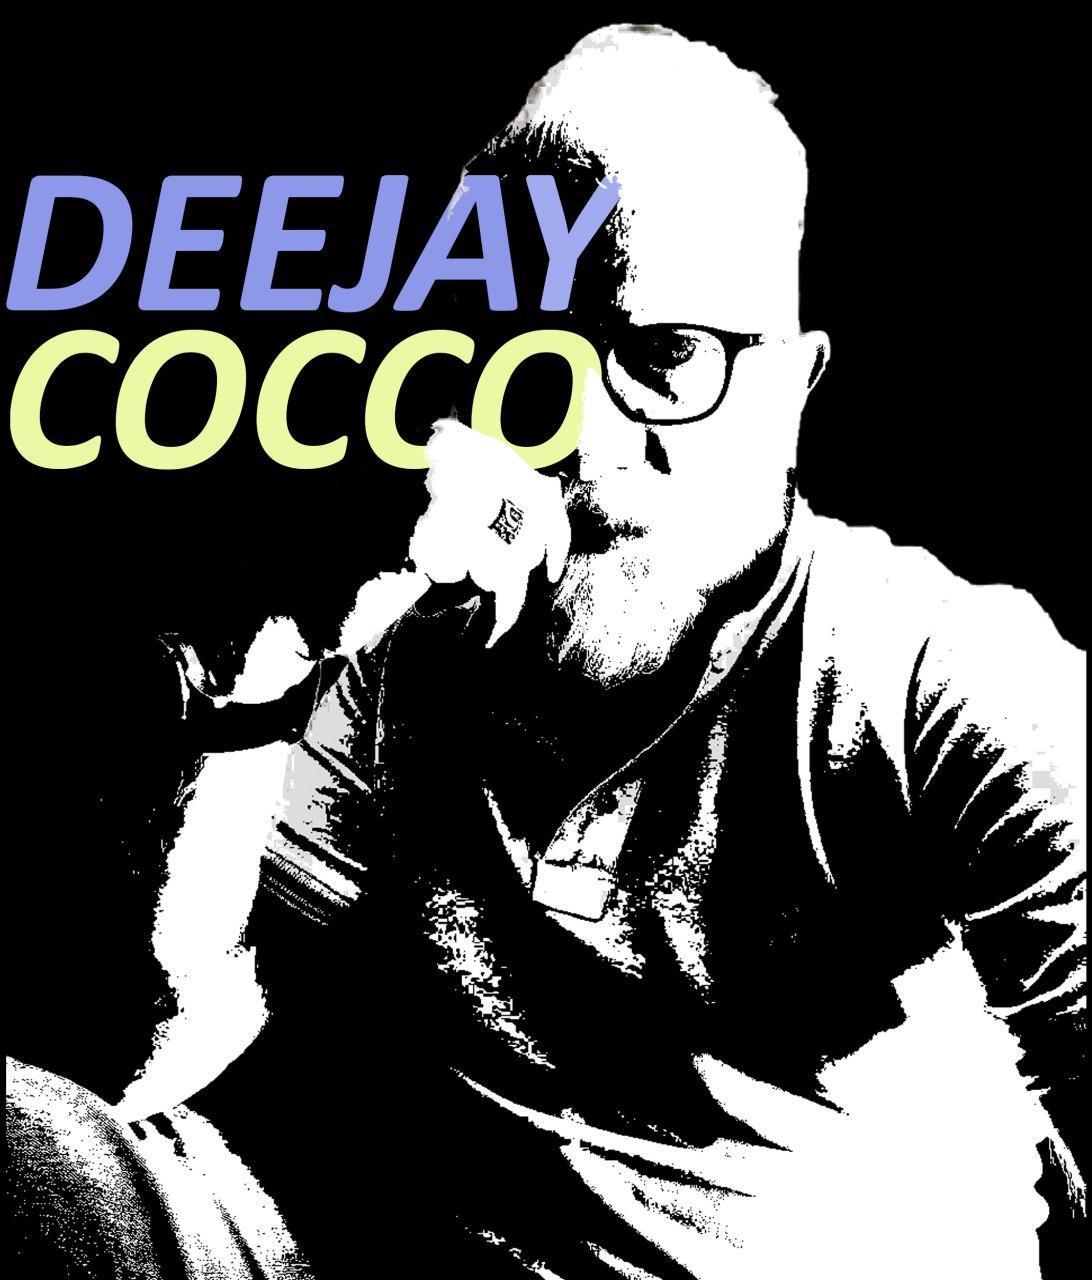 Deejay Cocco